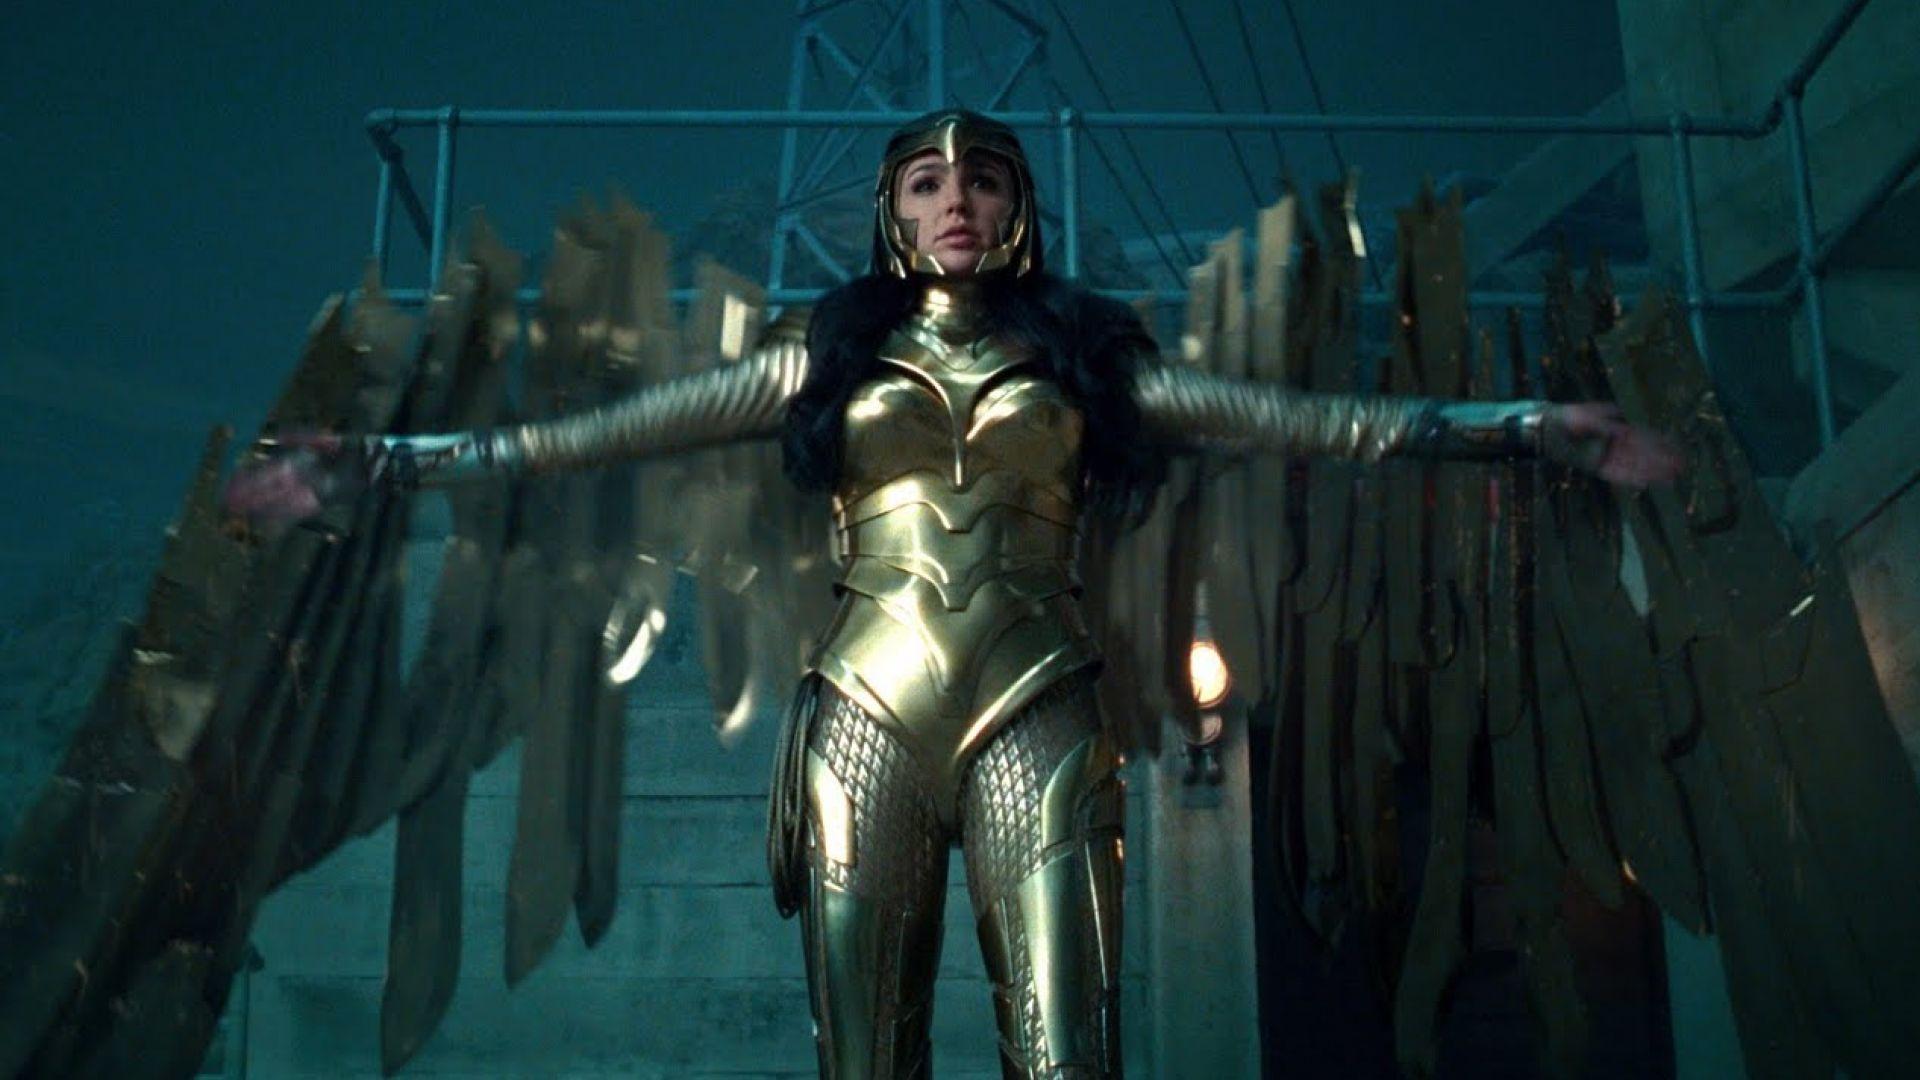 Wonder Woman 1984 New Trailer from DC FanDome